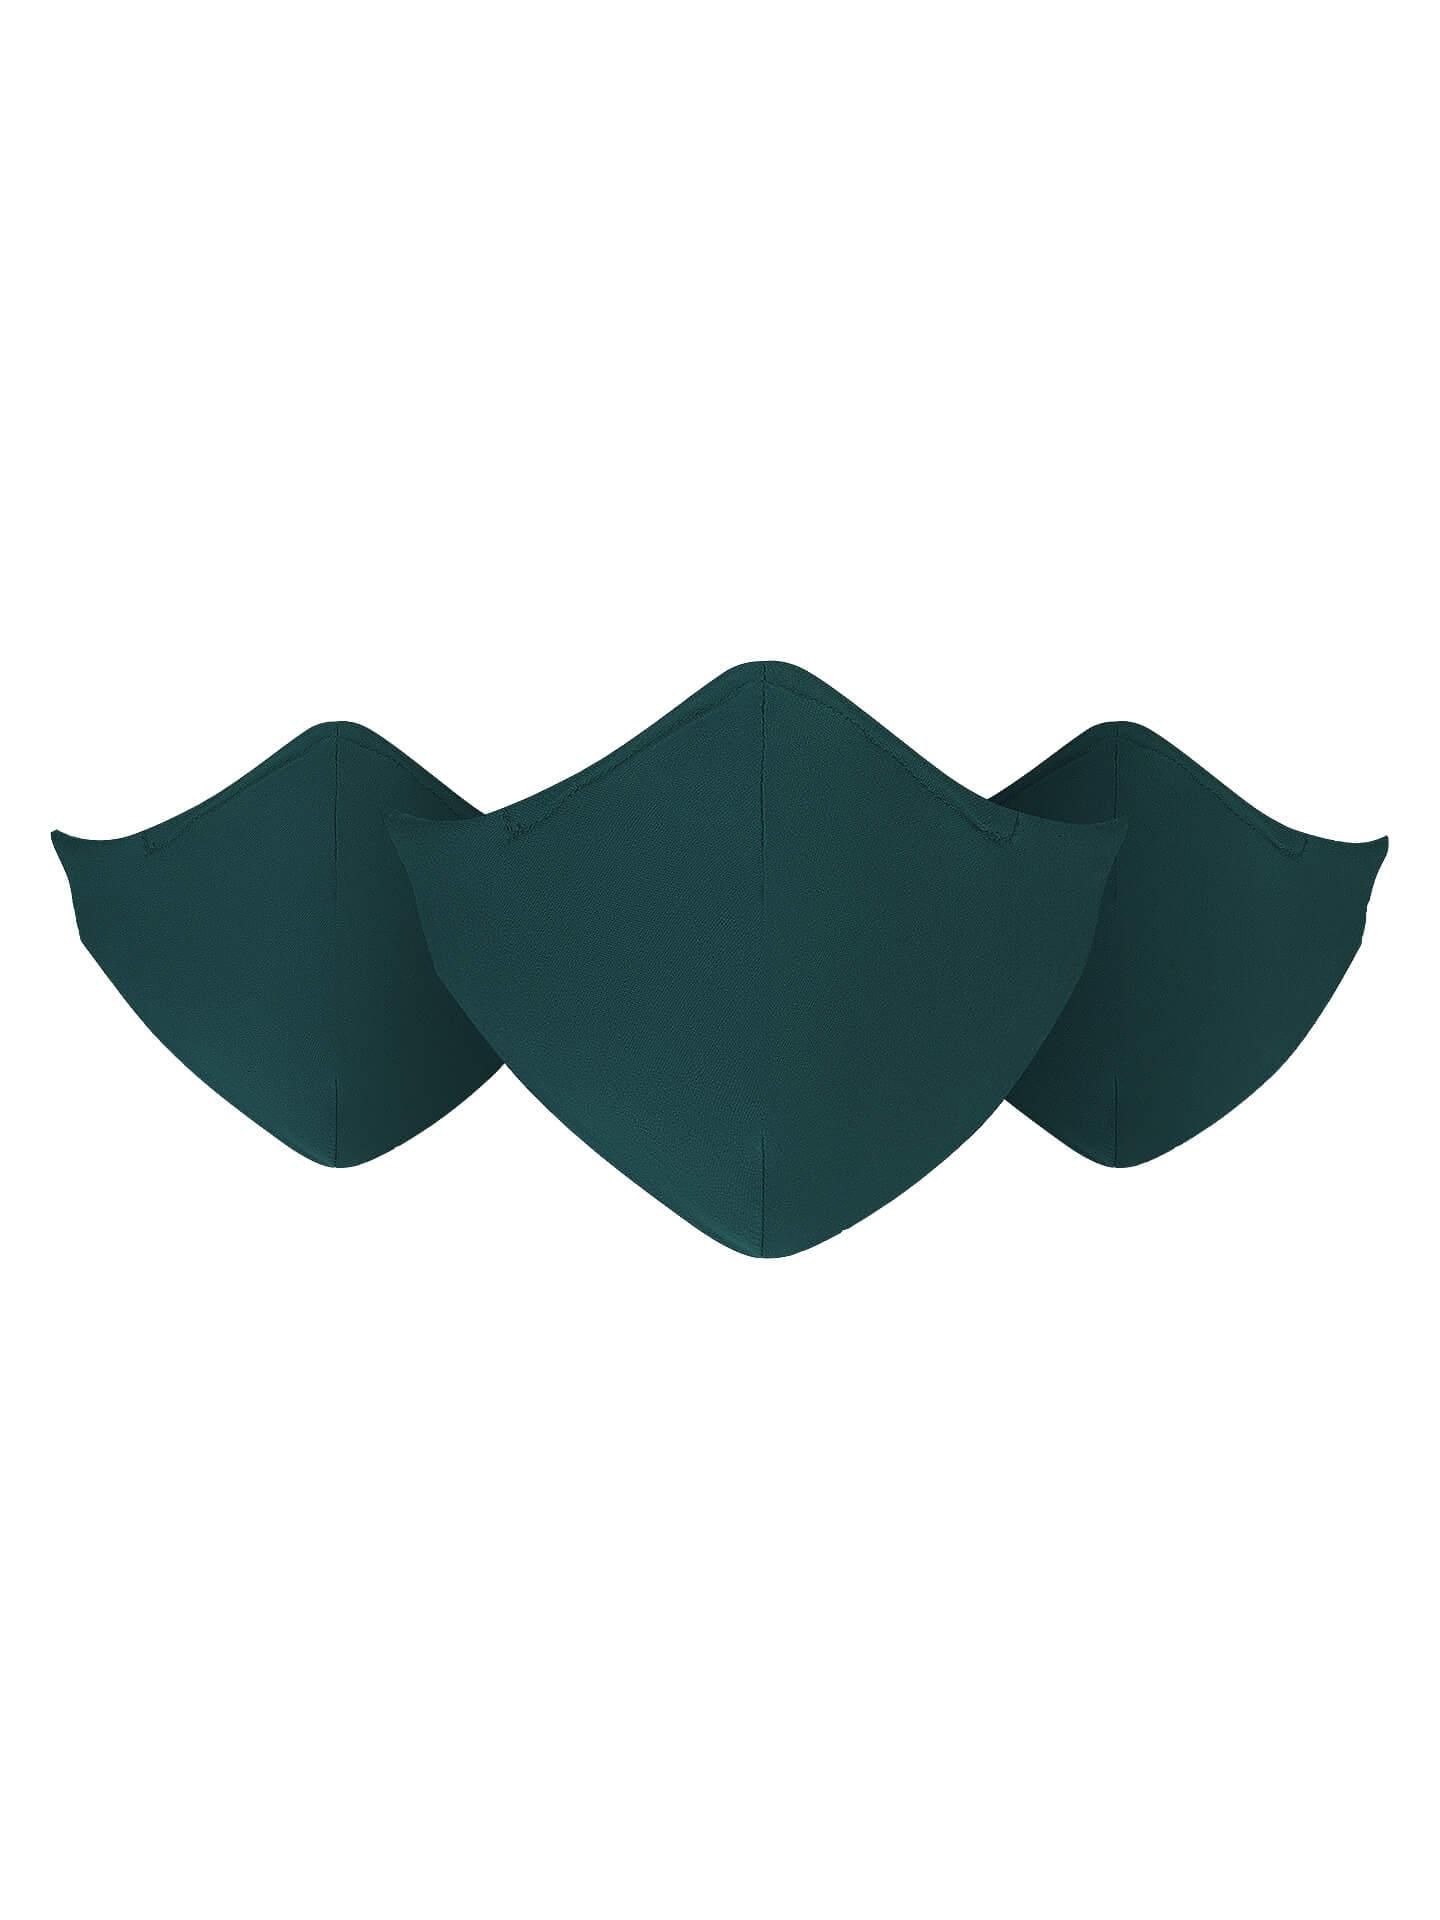 Três Máscaras Reutilizáveis e Laváveis Verdes